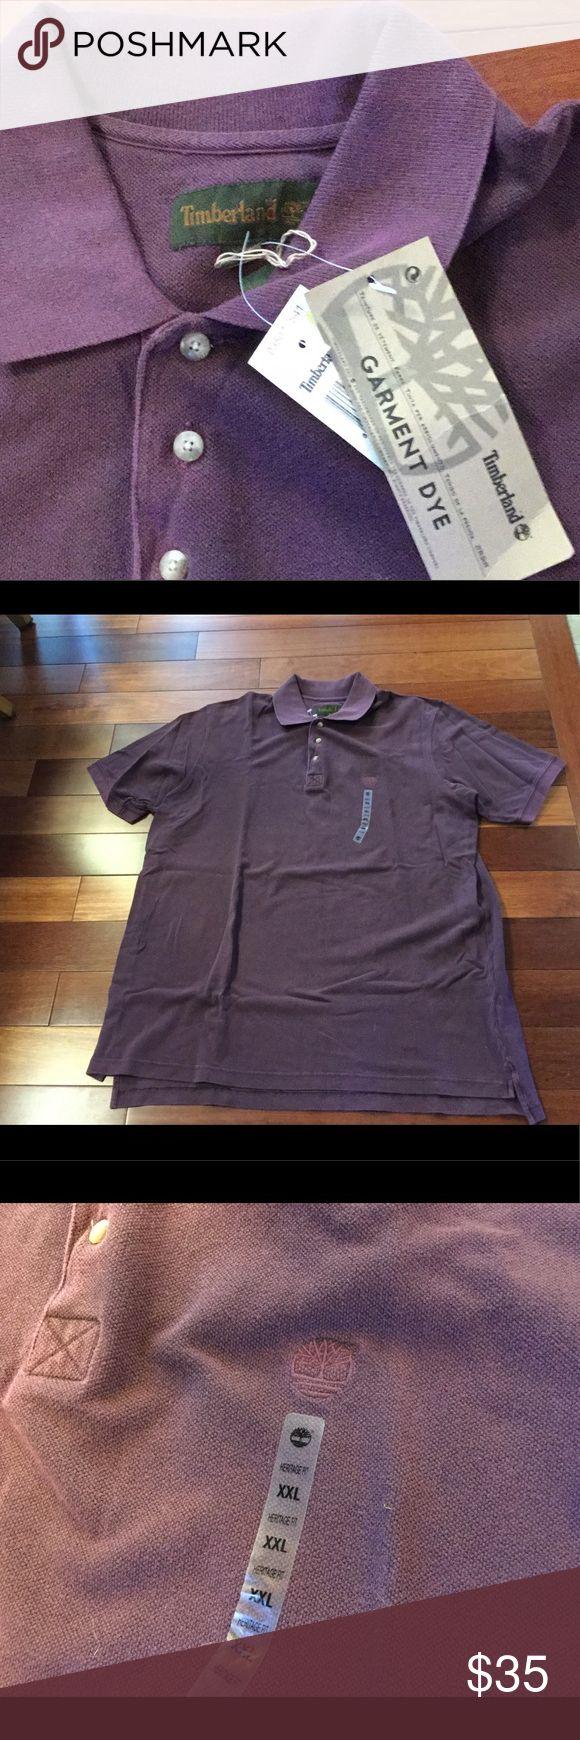 🆕 Men's Timberland Polo Shirt NWT men's Timberland polo shirt. Burgundy in color. Timberland Shirts Polos